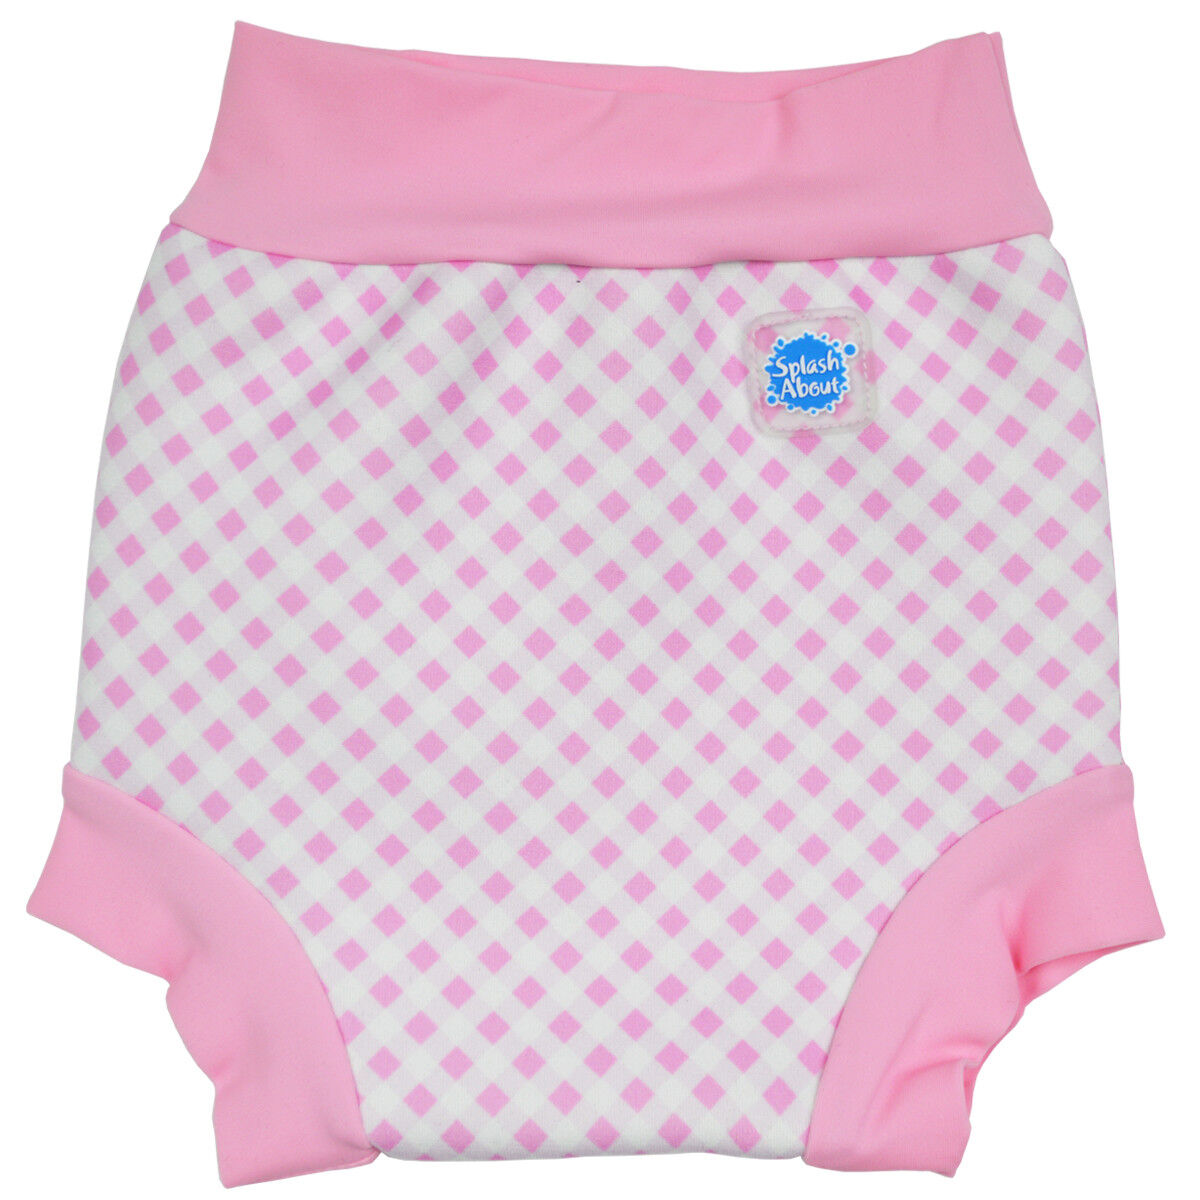 Splash About Happy Nappy BRAND NEW SEALED Pink Blossom Medium size 3-8 Months